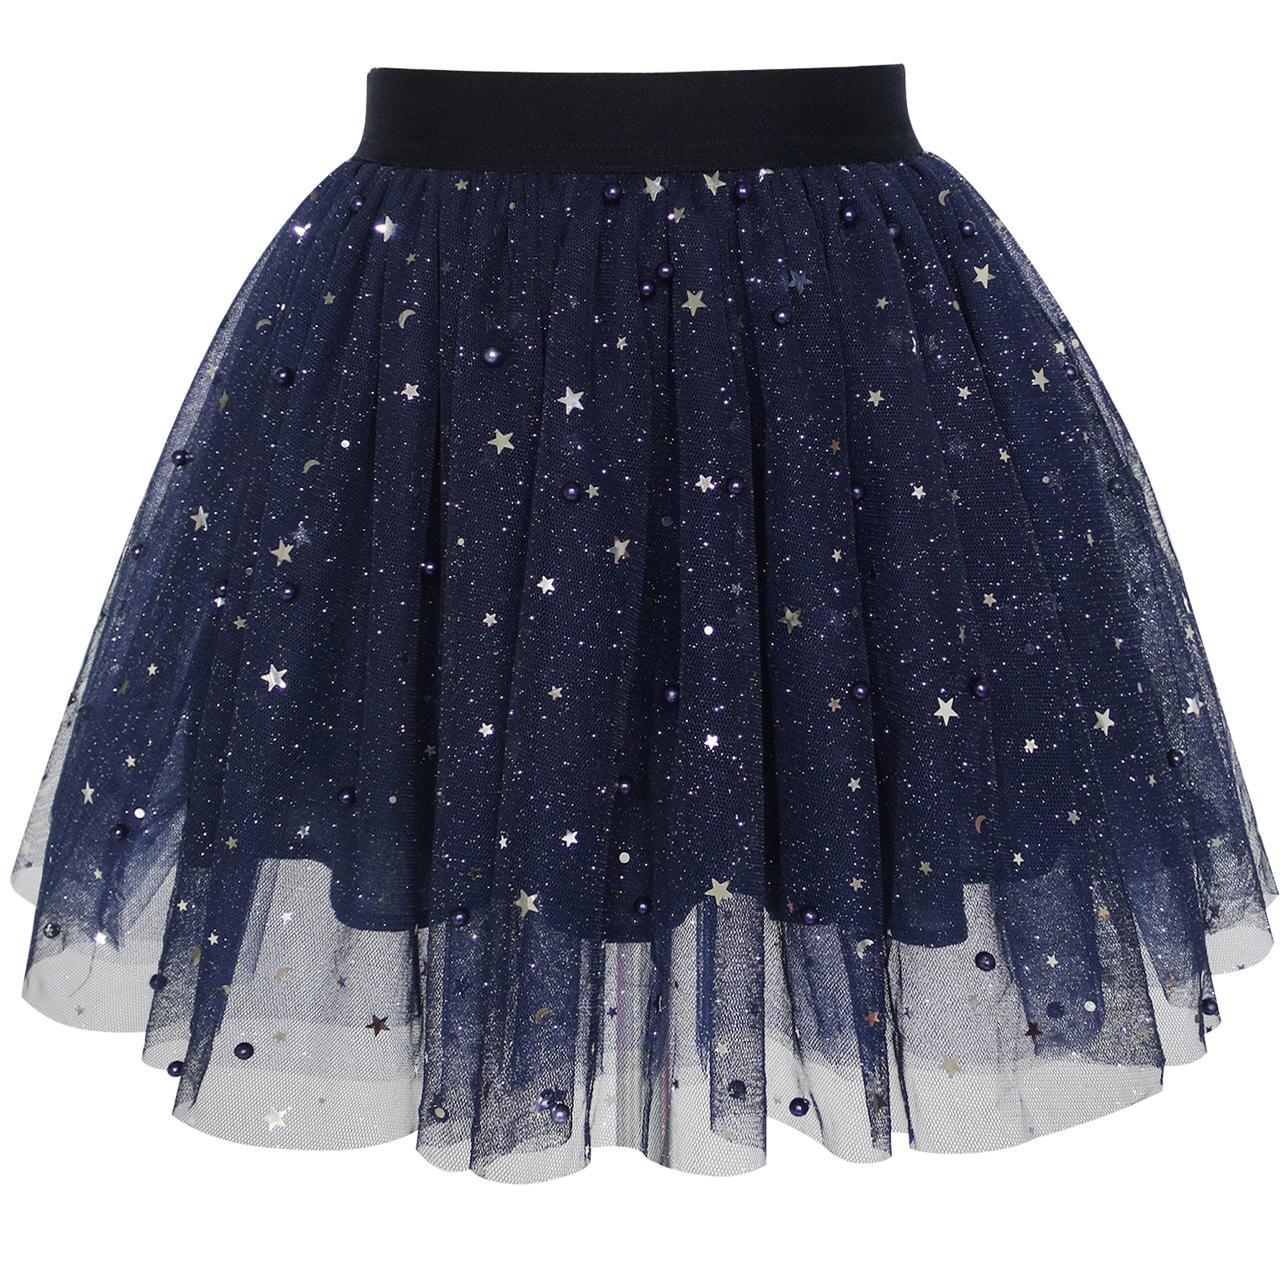 Sunny Fashion Ragazze Gonna Blu navy Perla Stelle scintillante tutu danza